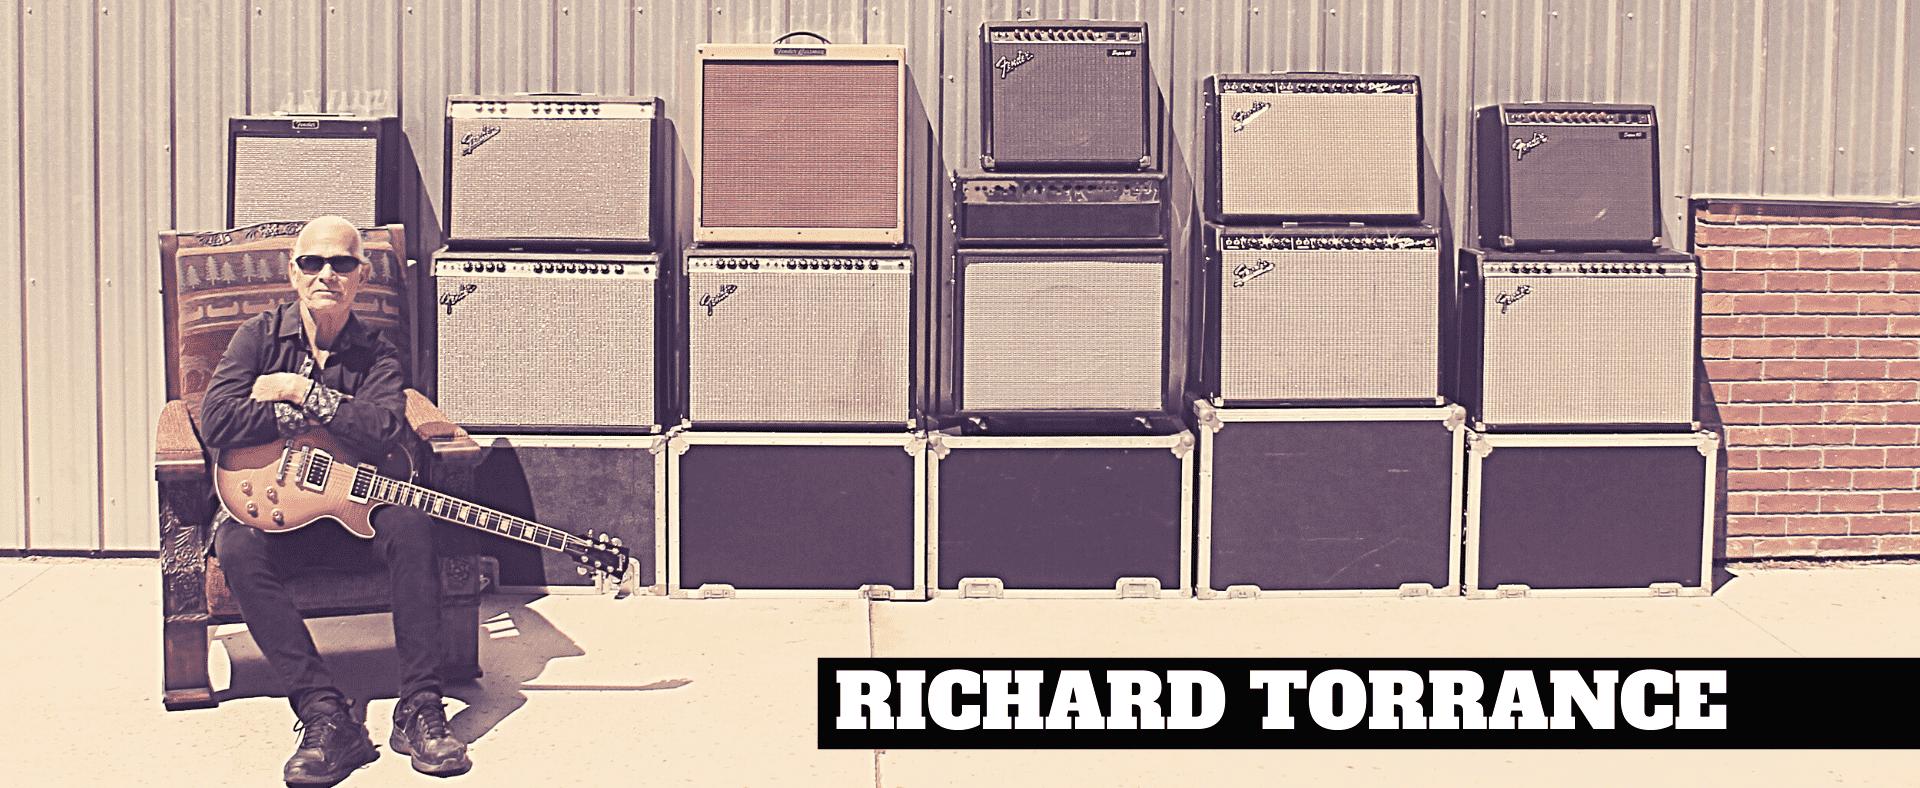 Richard Torrance